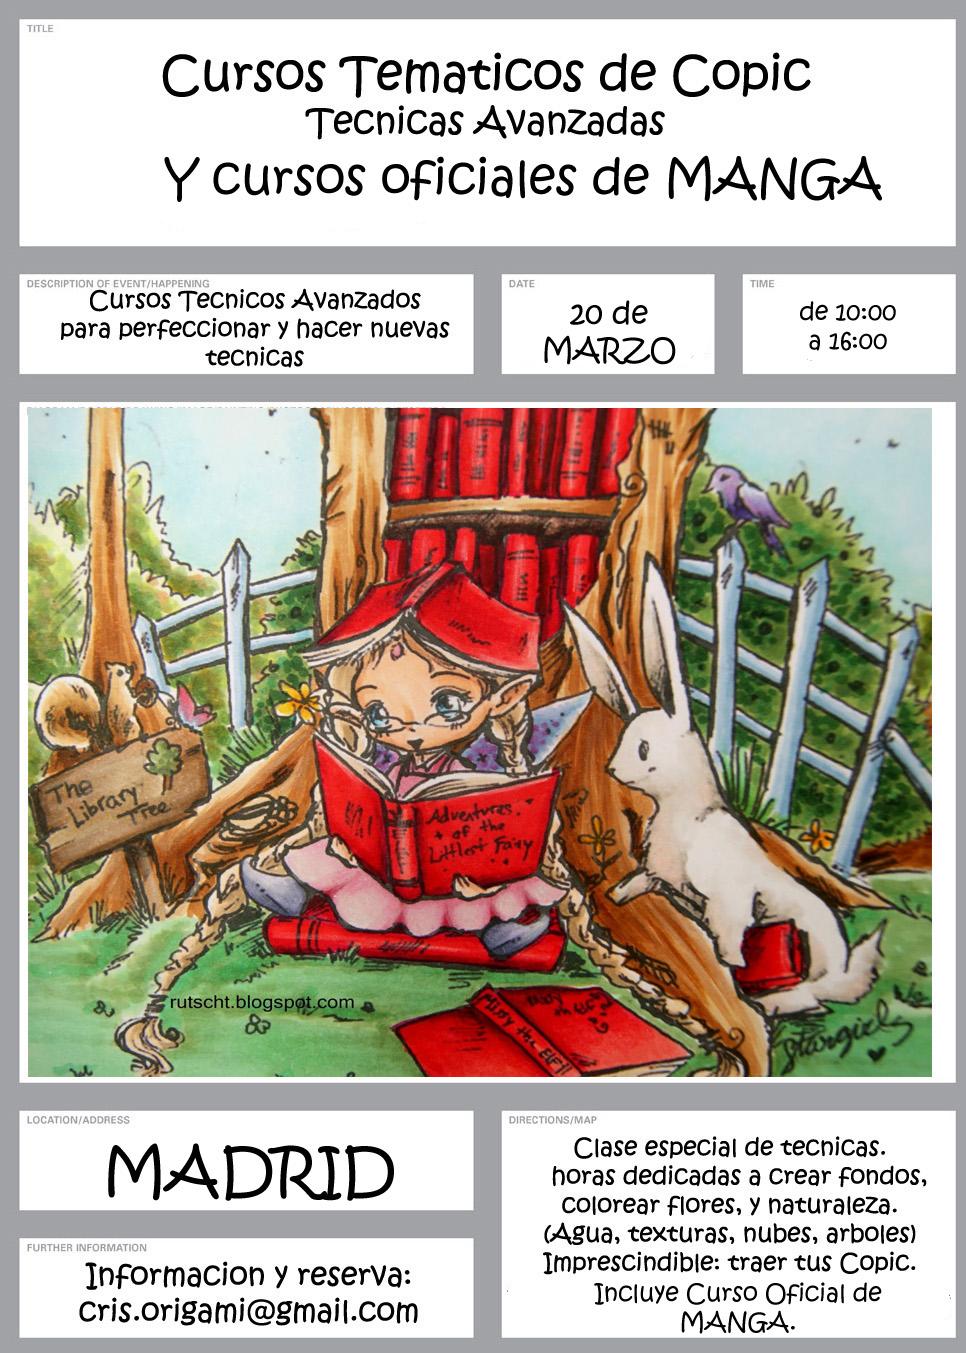 Copic marker espa a cursos de nivel superior y cursos - Cursos de manualidades en madrid ...